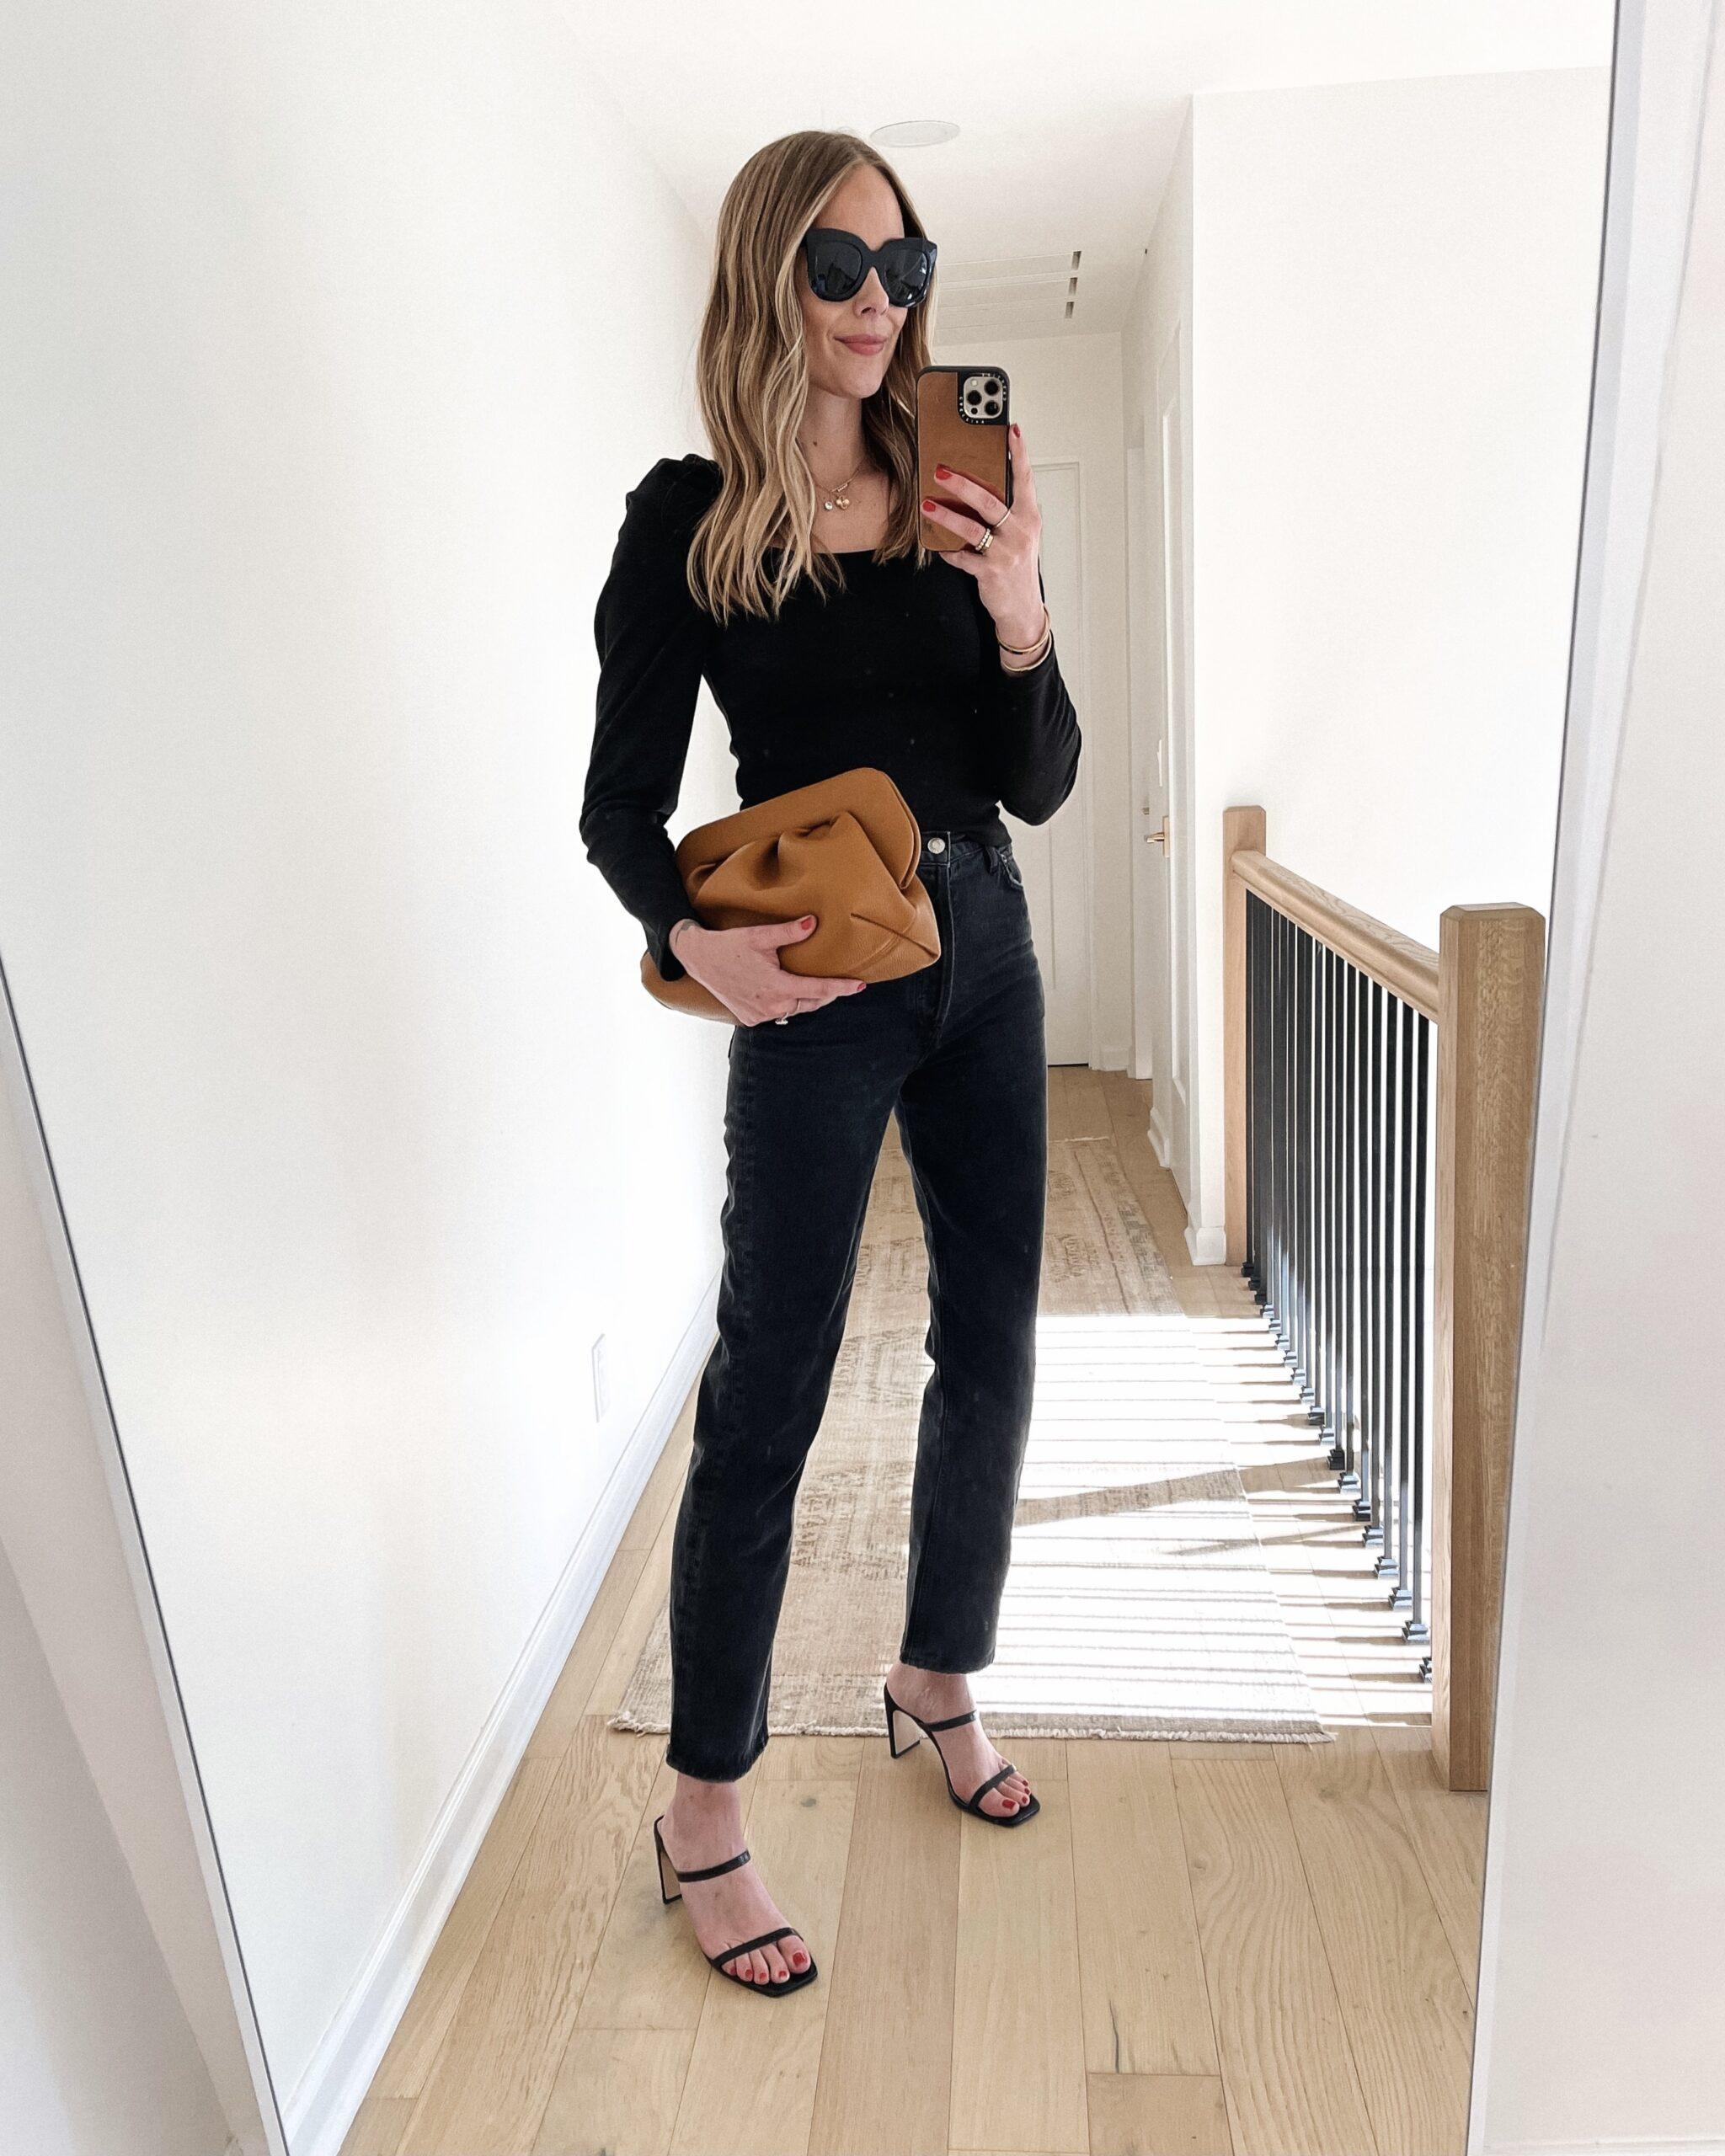 Fashion Jackson Wearing Black Puff Sleeve Top Black Jeans Black Heeled Sandals Themoire Tan Clutch Bag